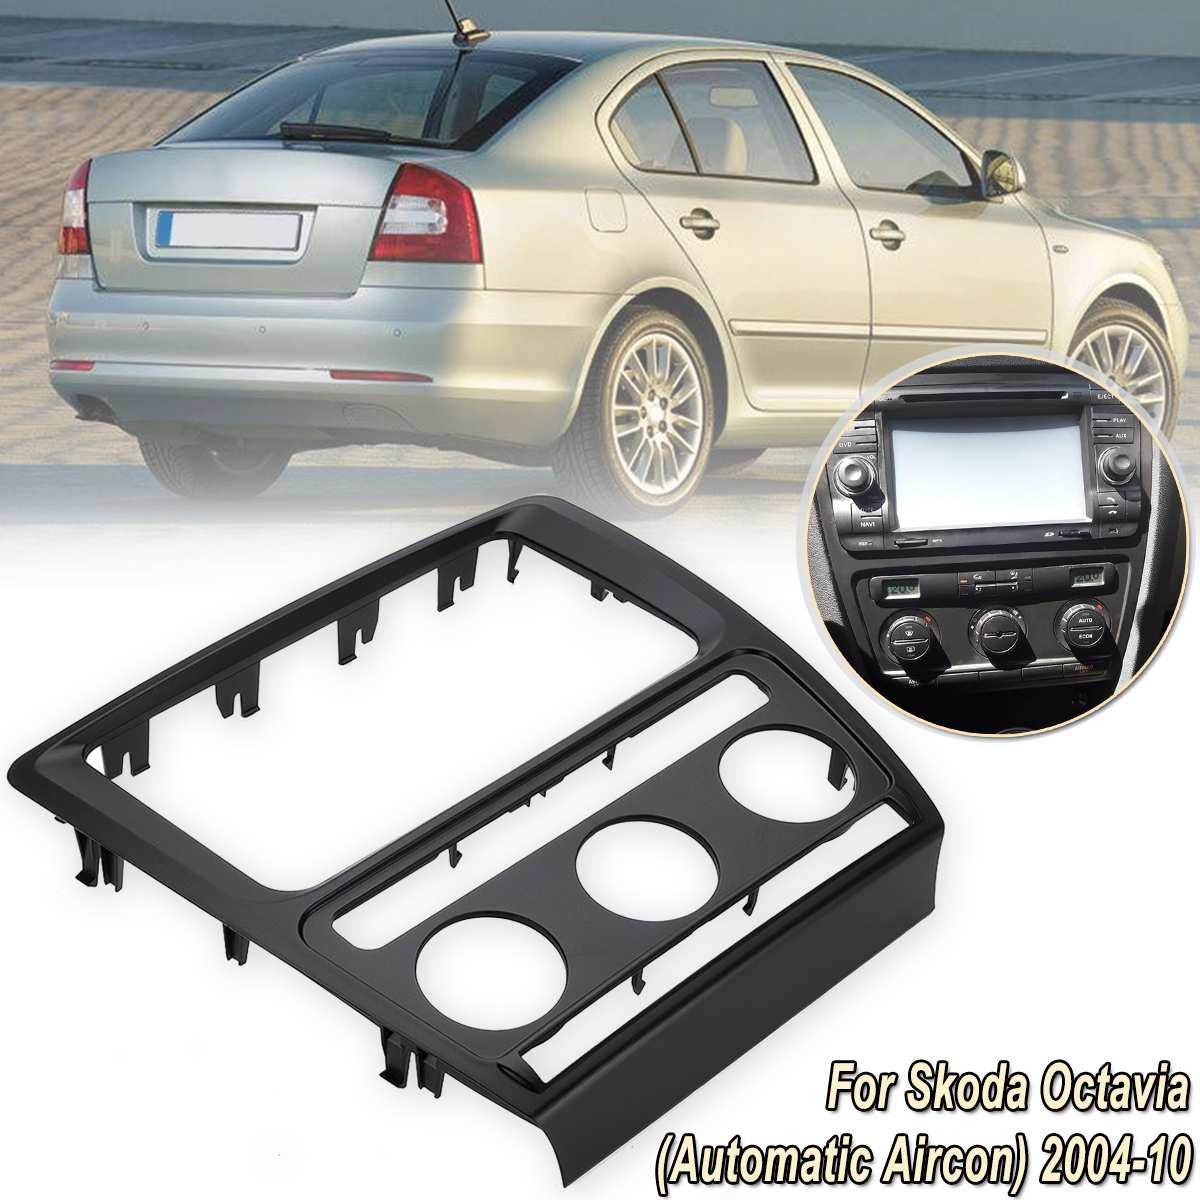 For Skoda Octavia (Automatic Aircon)  2004-2010 Radio Panel Dash Fascia Plate Frame DVD Stereo CD Panel Dash Kit Trim